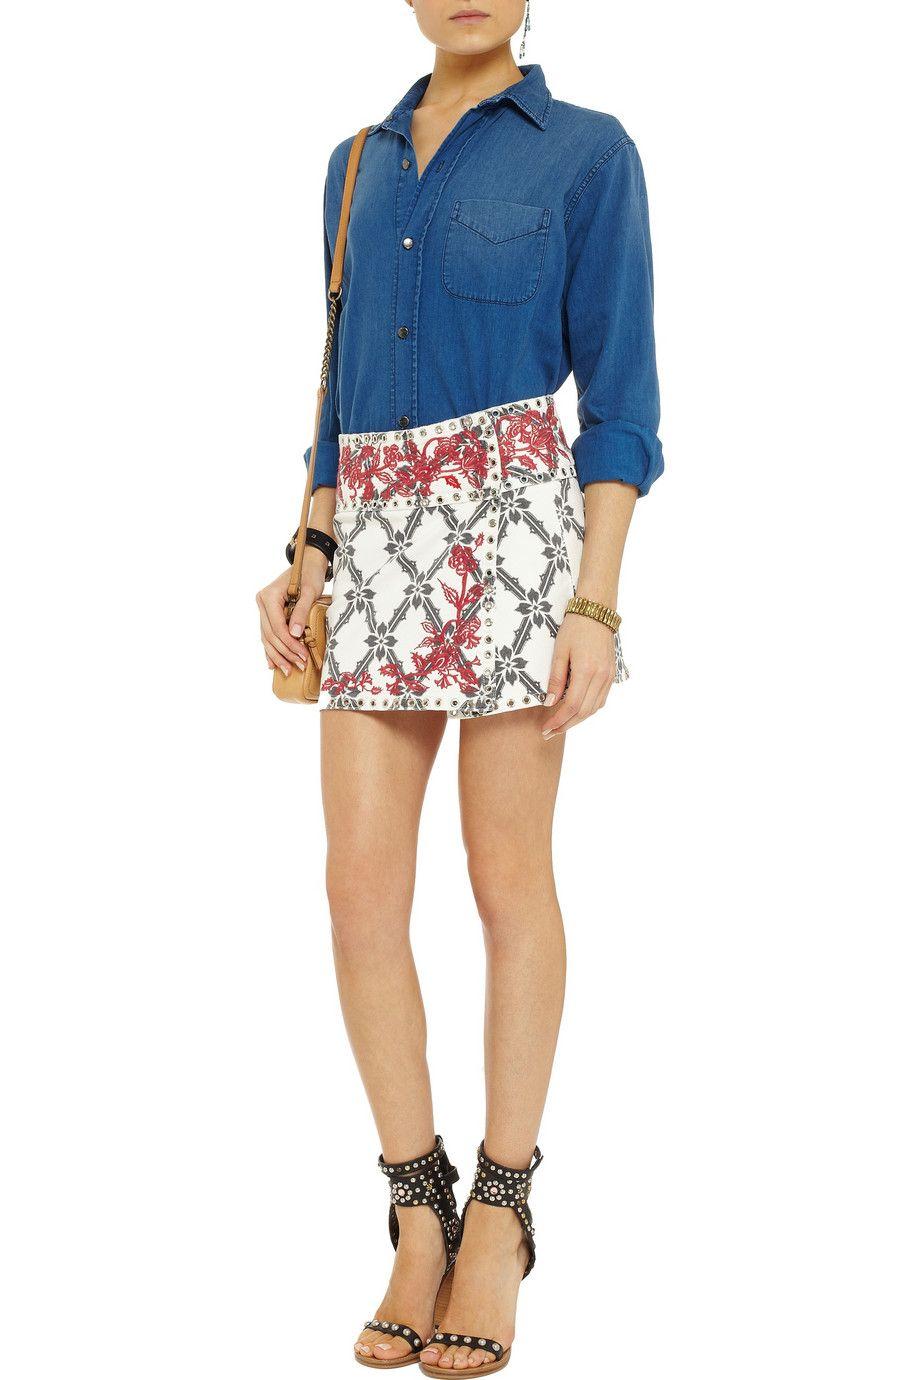 Isabel MarantGelicia embroidered denim mini skirtfront